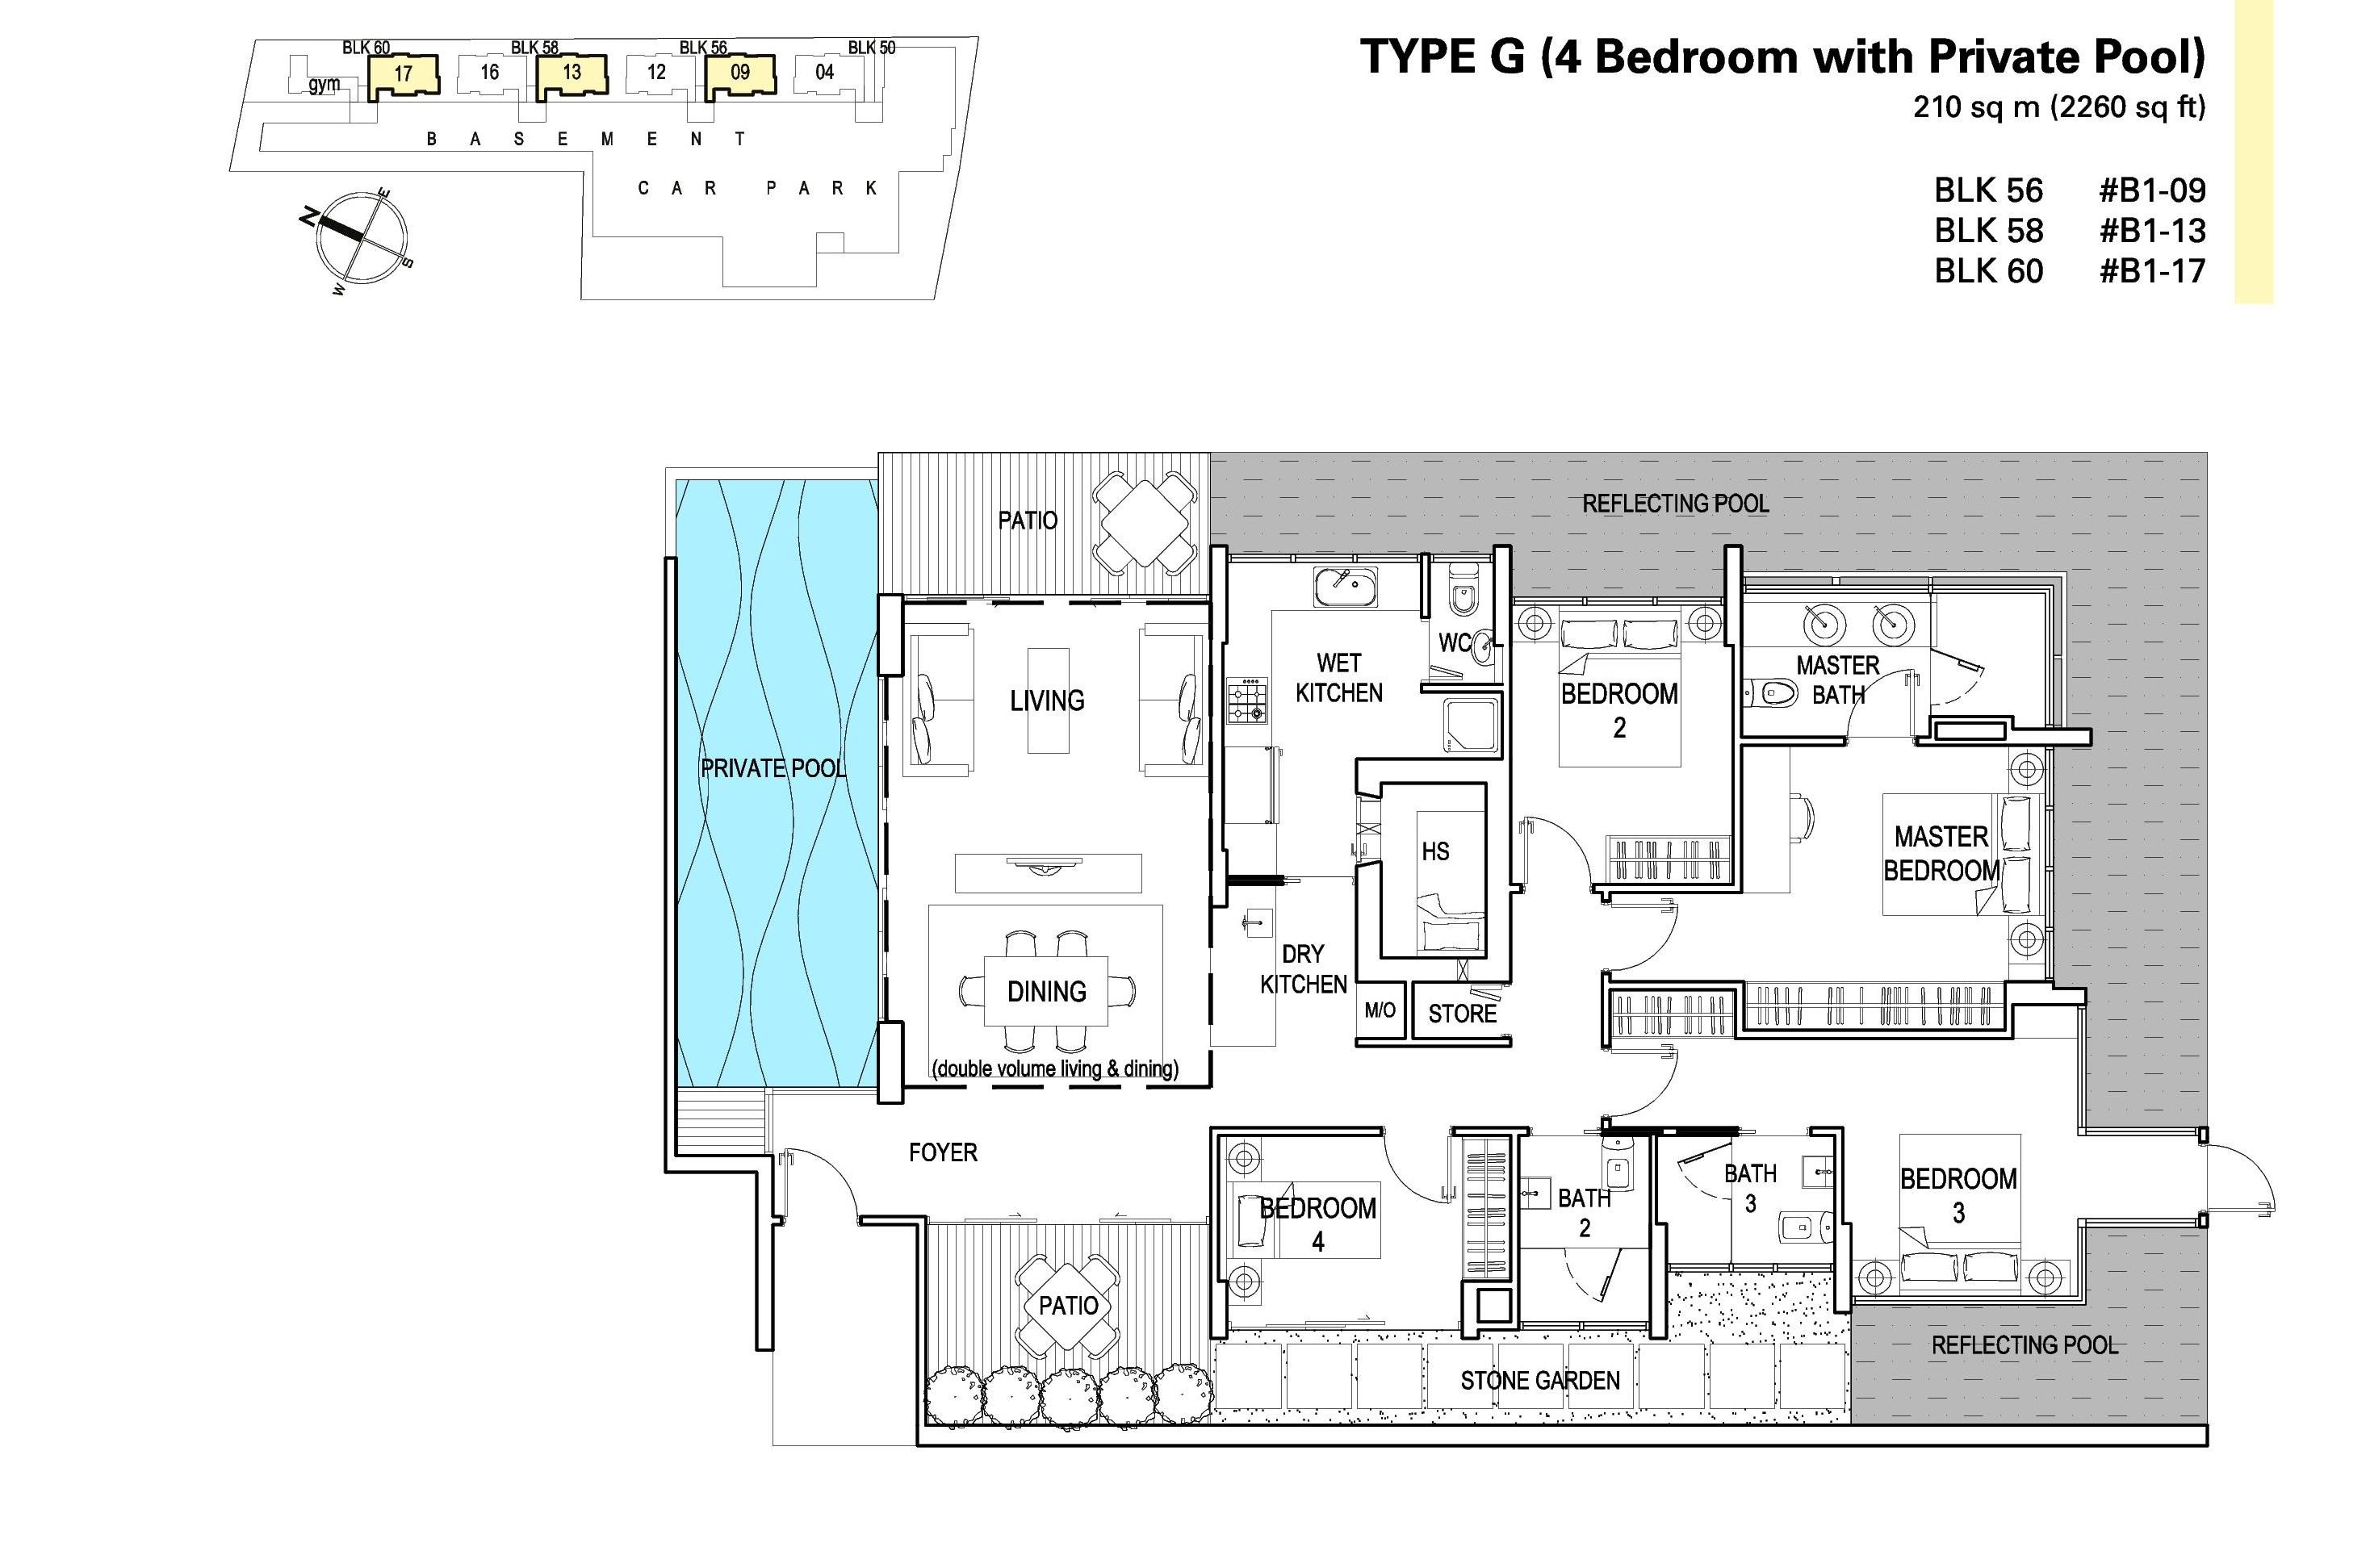 4 Bedroom(Pool) - St Patrick's Residences